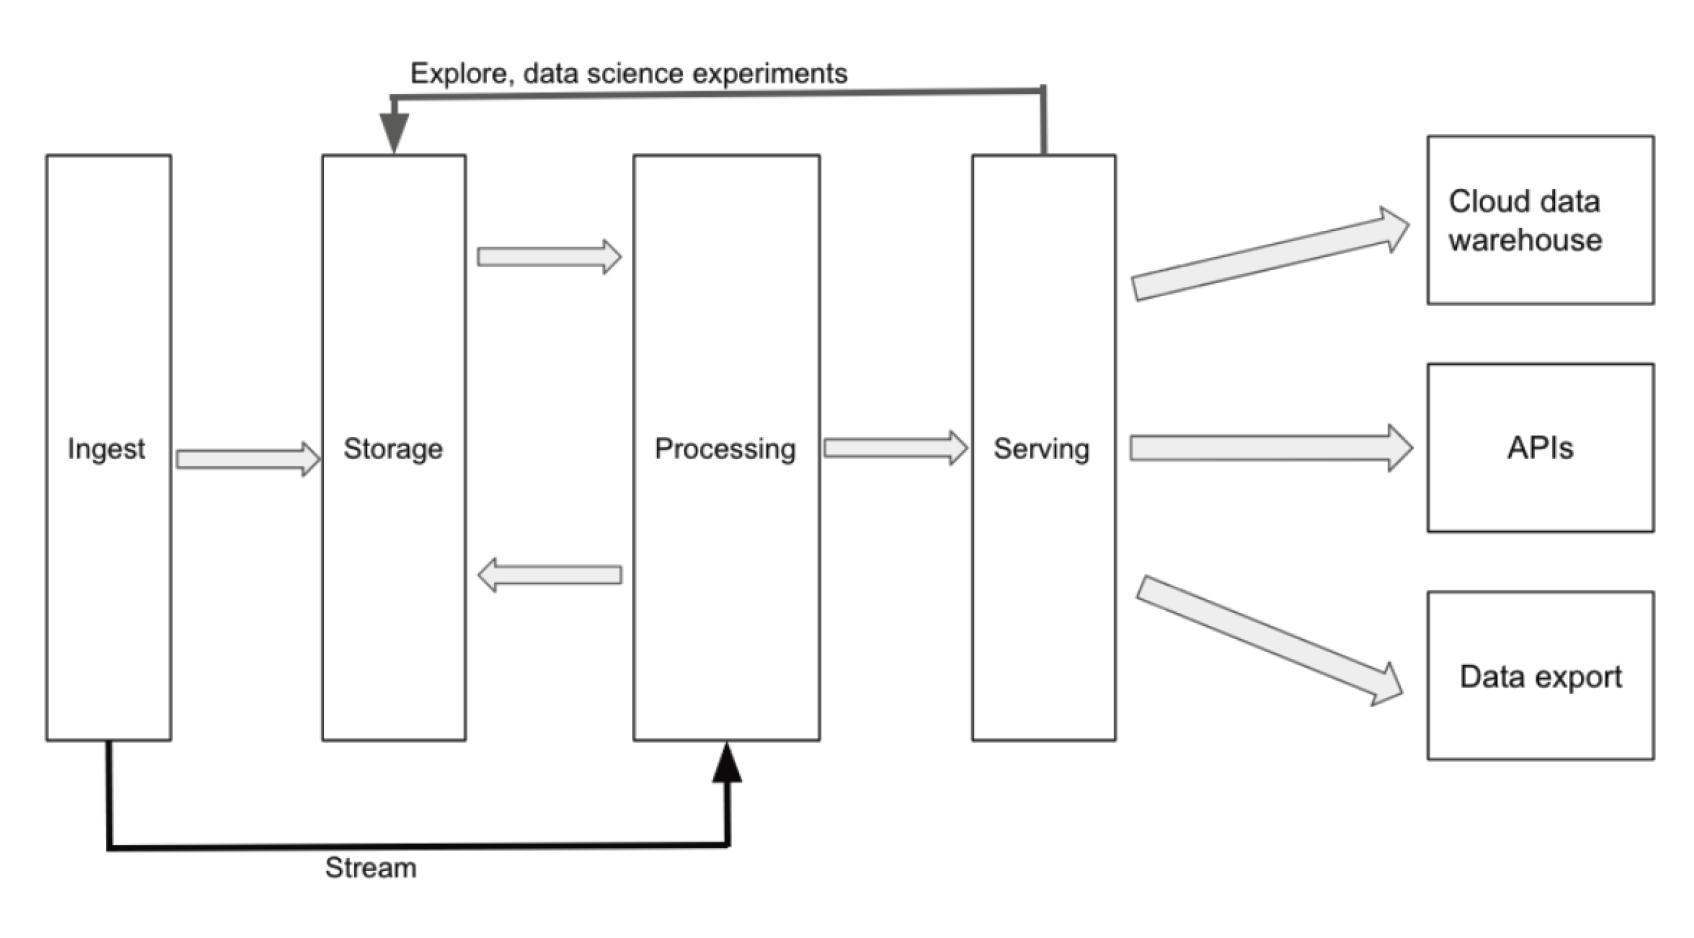 Simplified Cloud data platform design